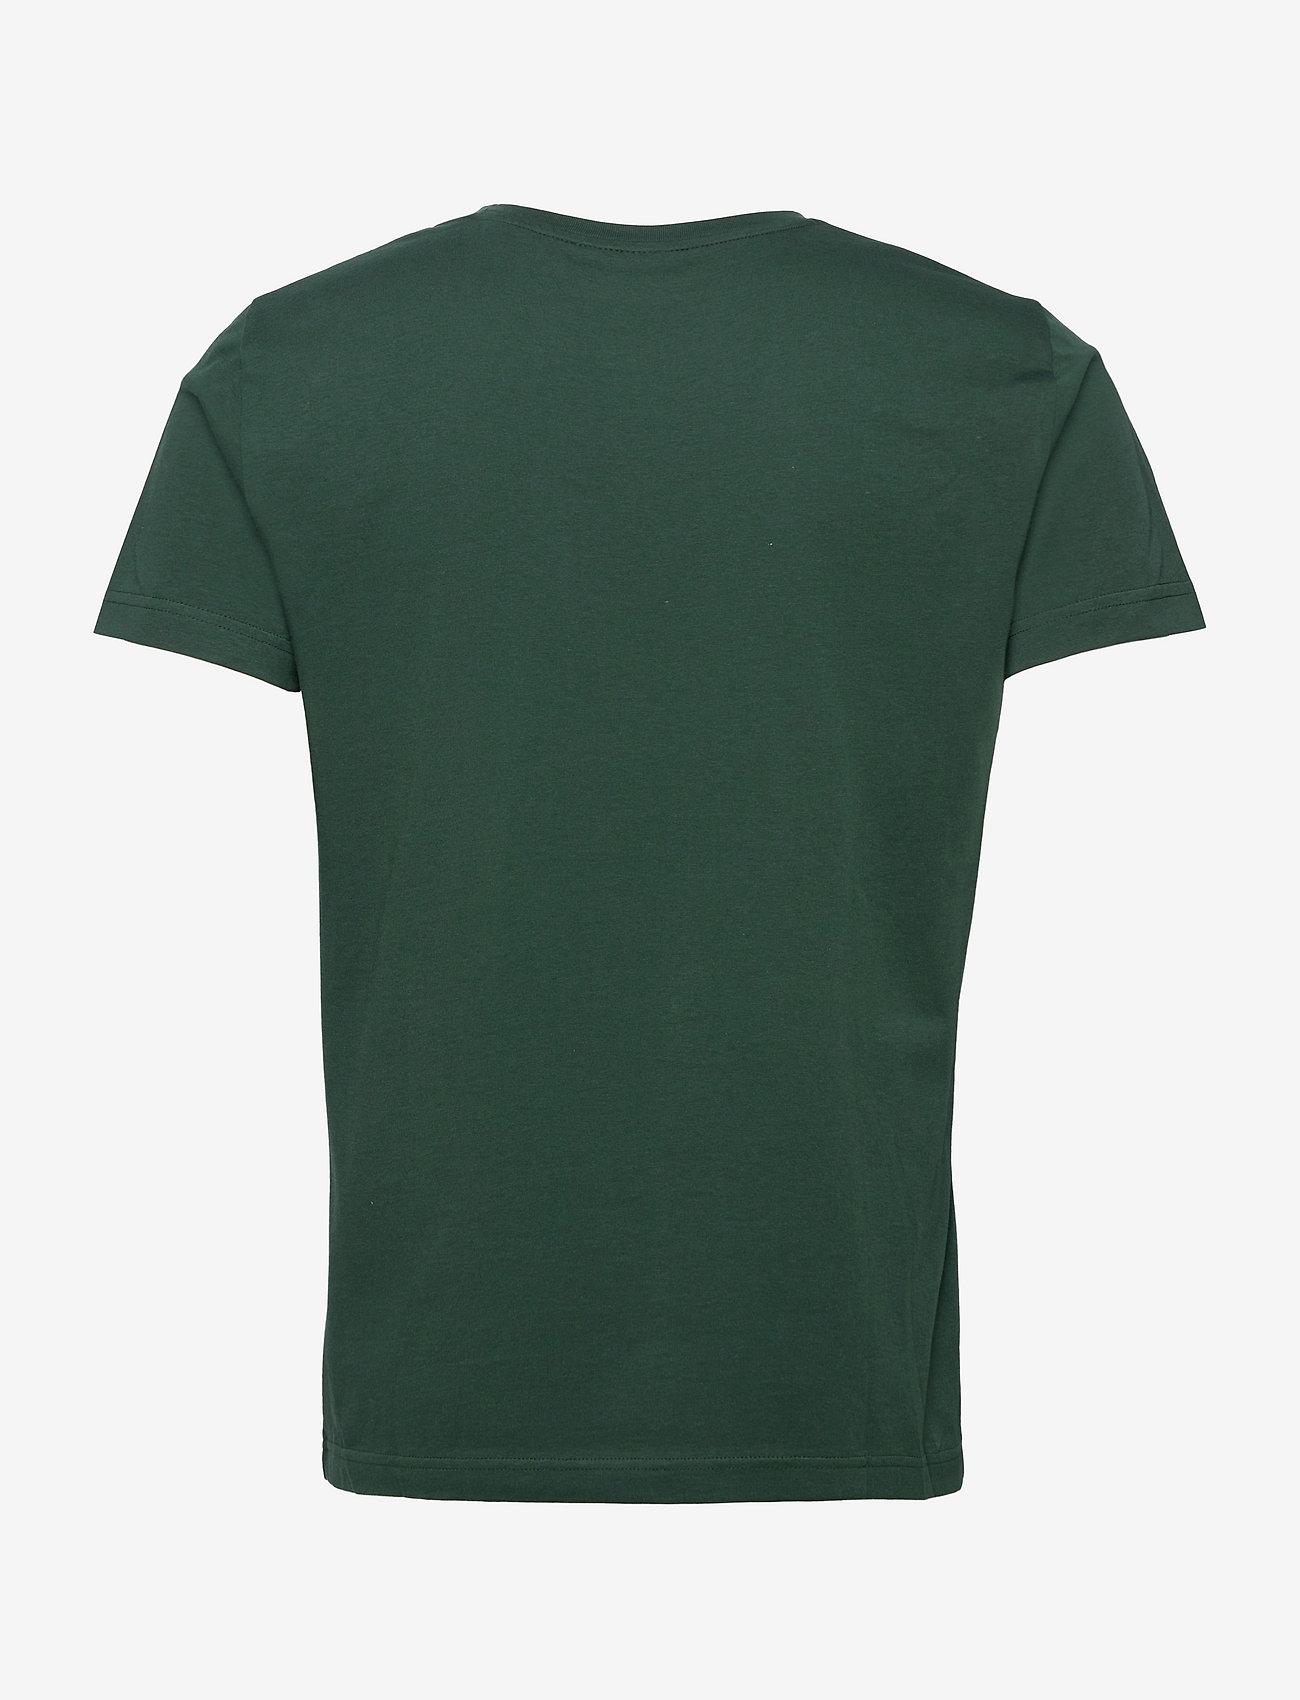 GANT - MD. FALL SS T-SHIRT - short-sleeved t-shirts - tartan green - 1